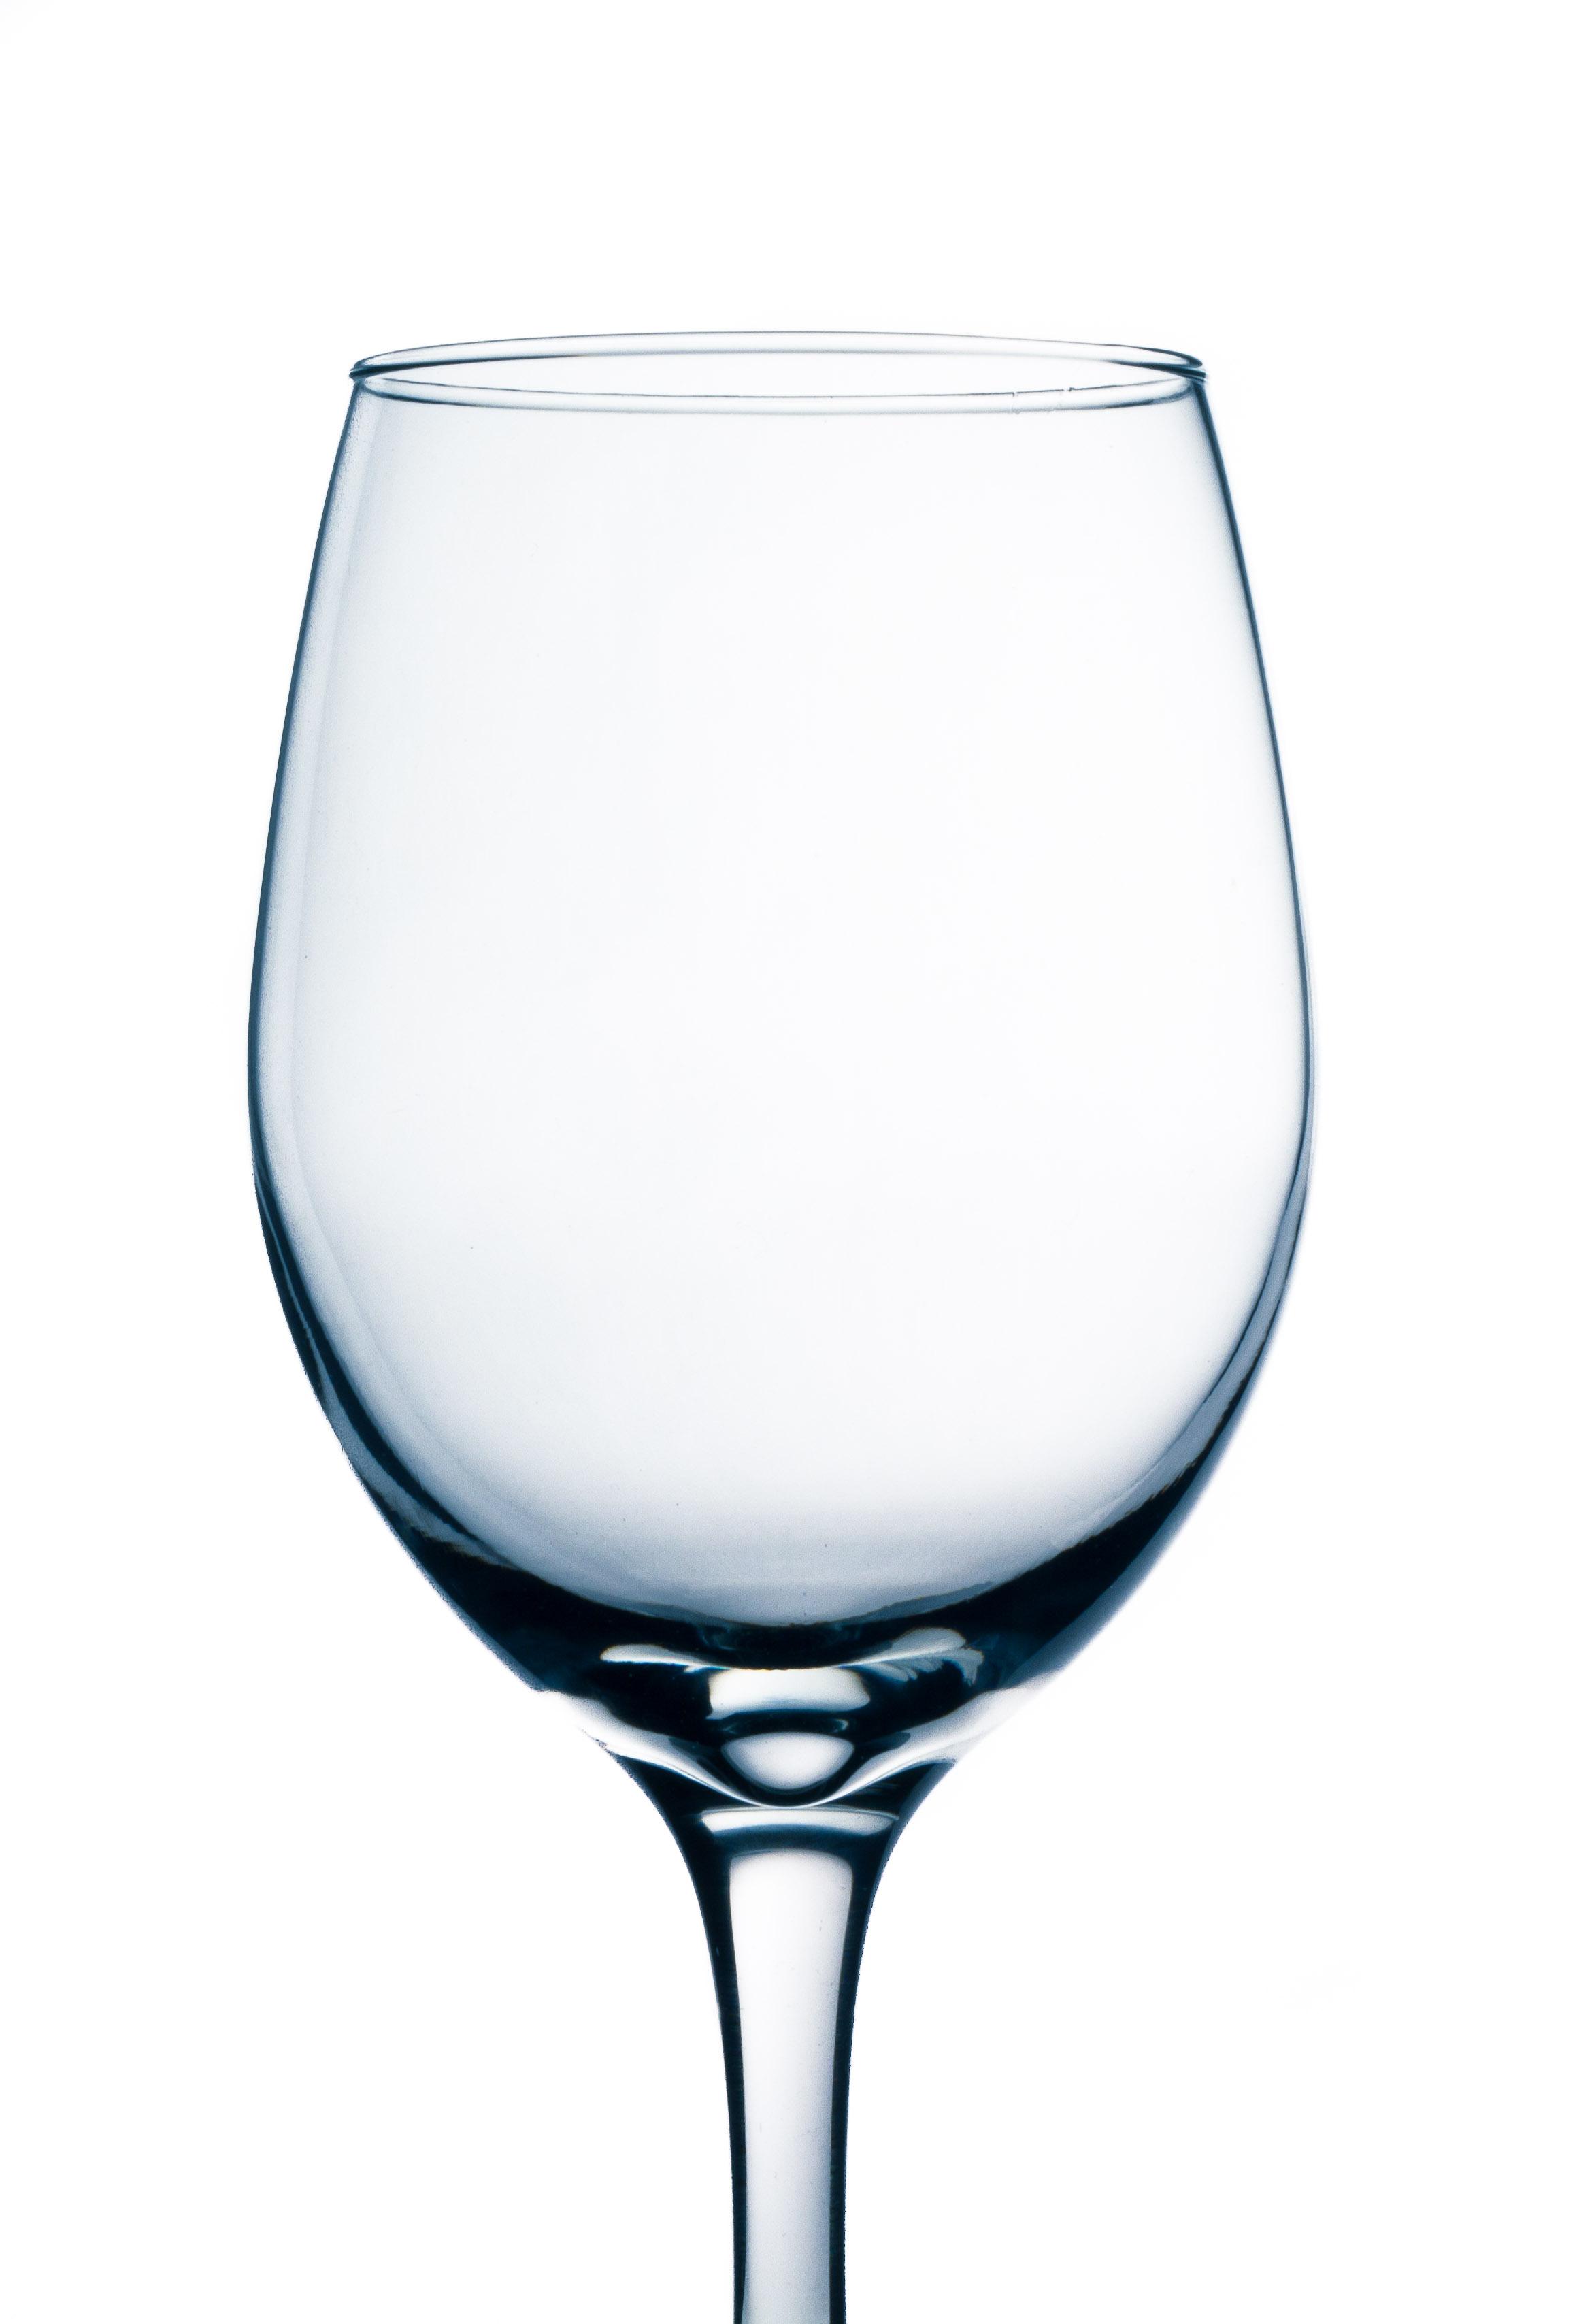 Drinking White Wine Keeps You Awake